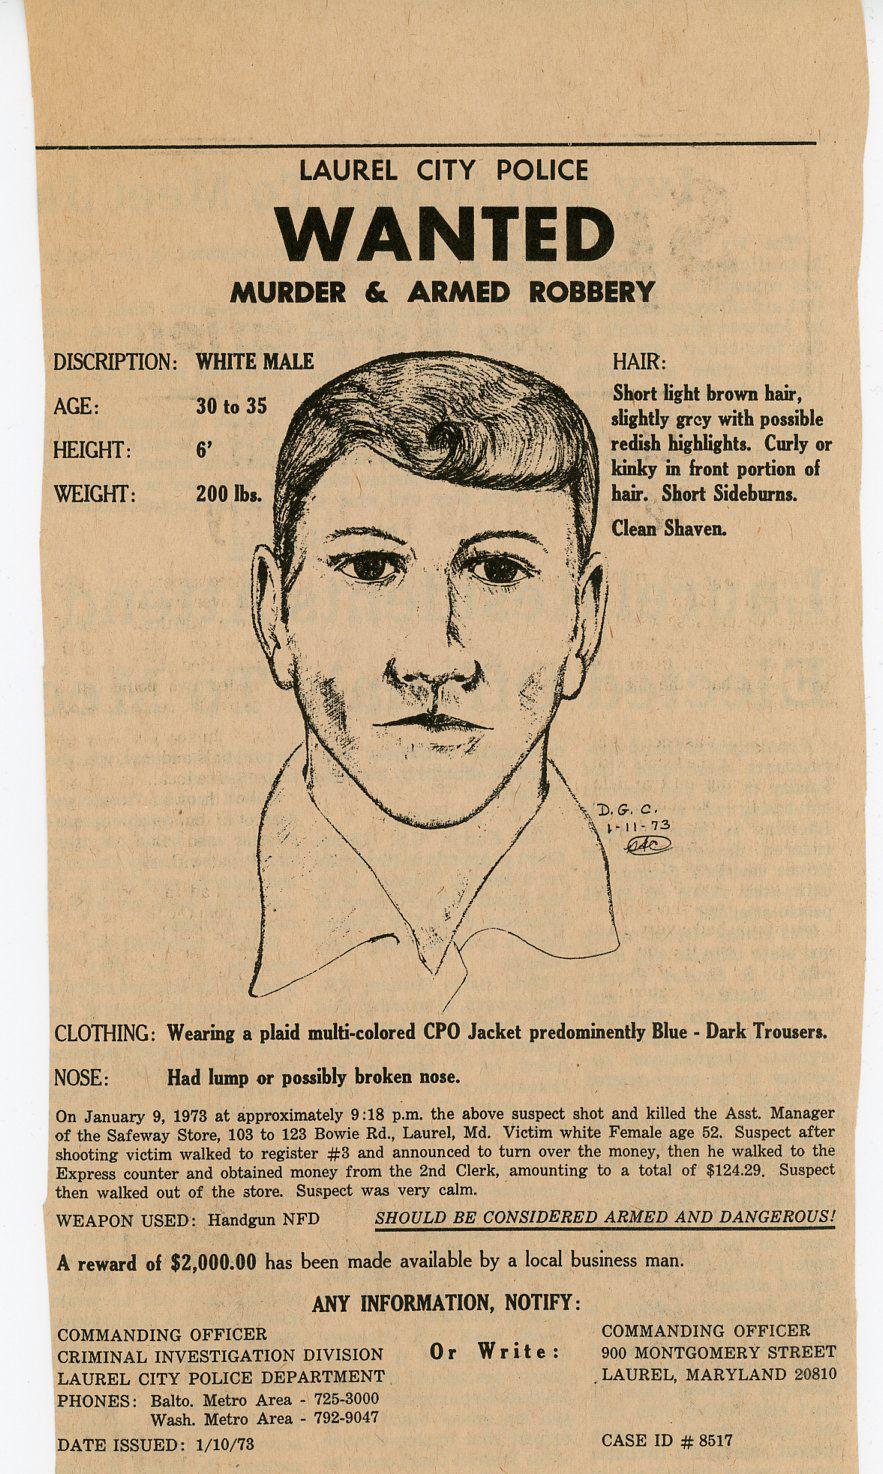 Richard Friend – The Laurel History Boys